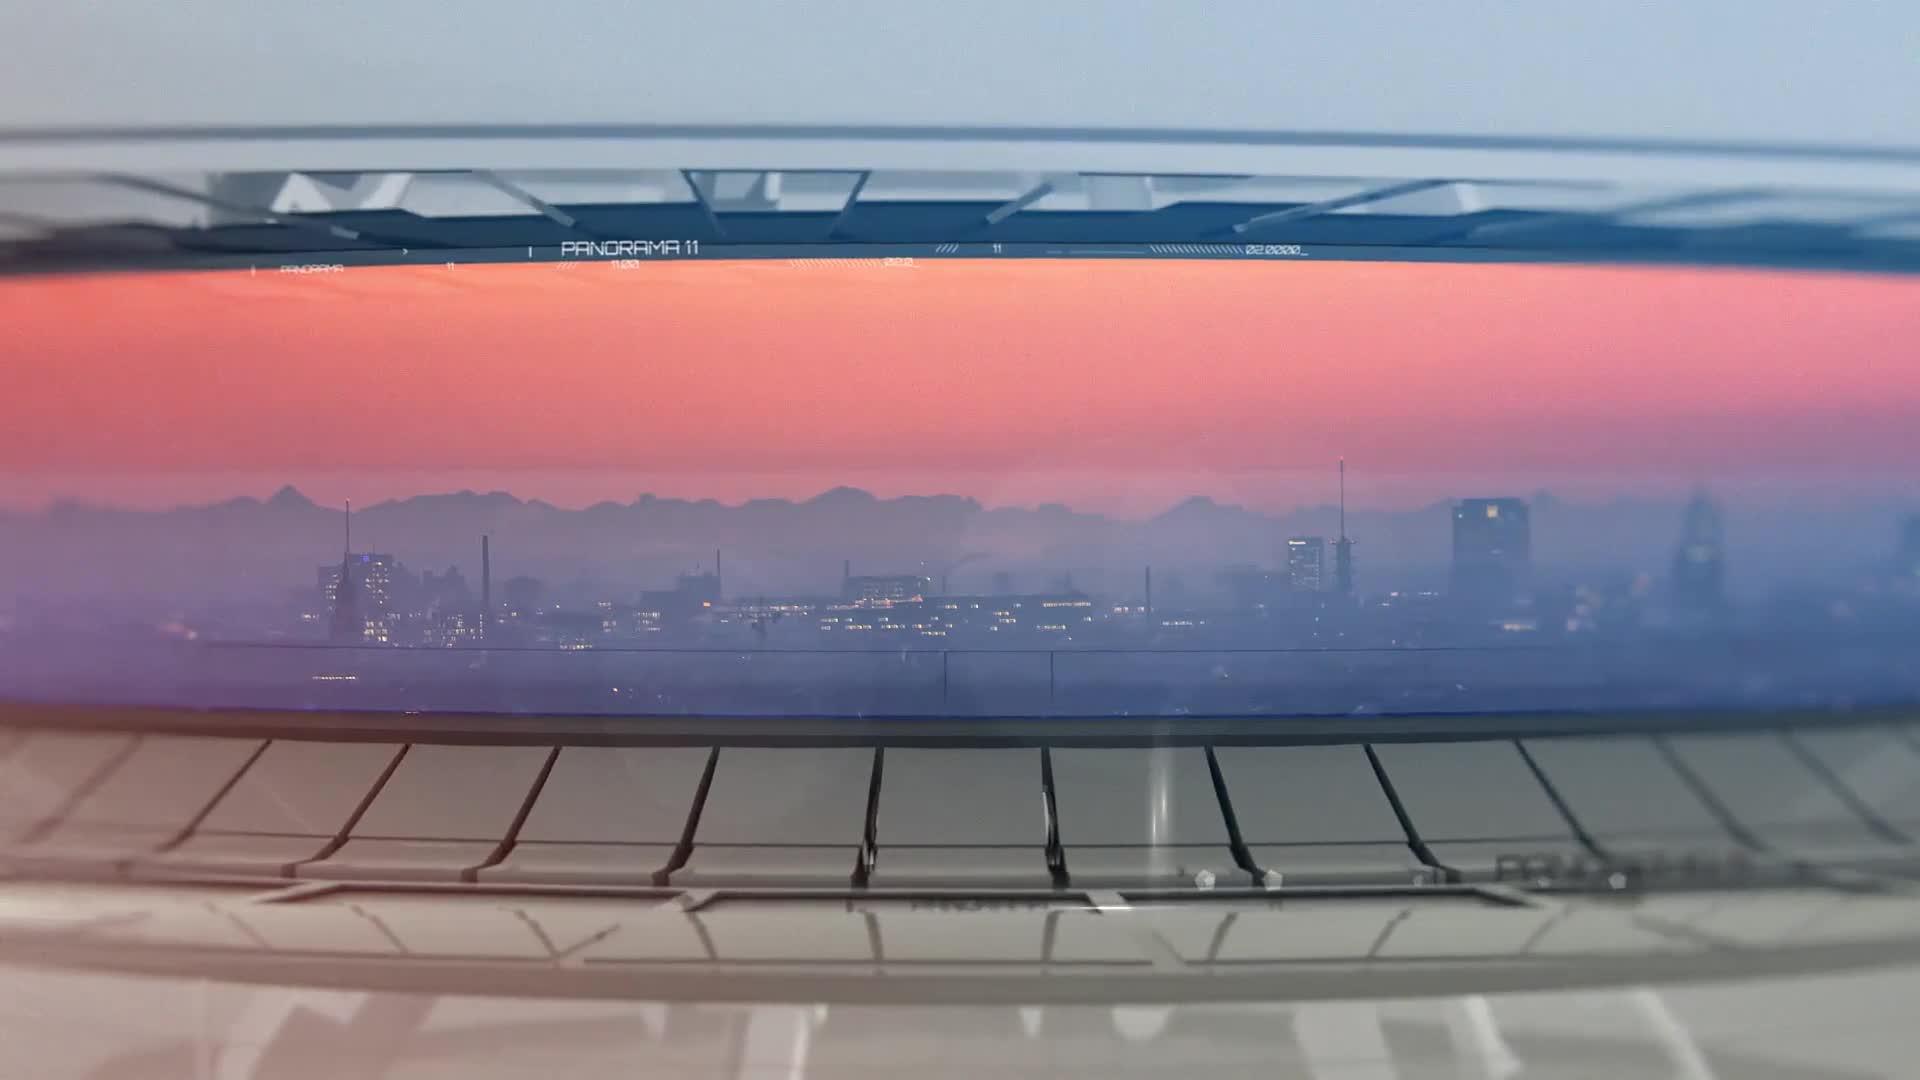 3D Panorama | Sci Fi Video Displays - Download Videohive